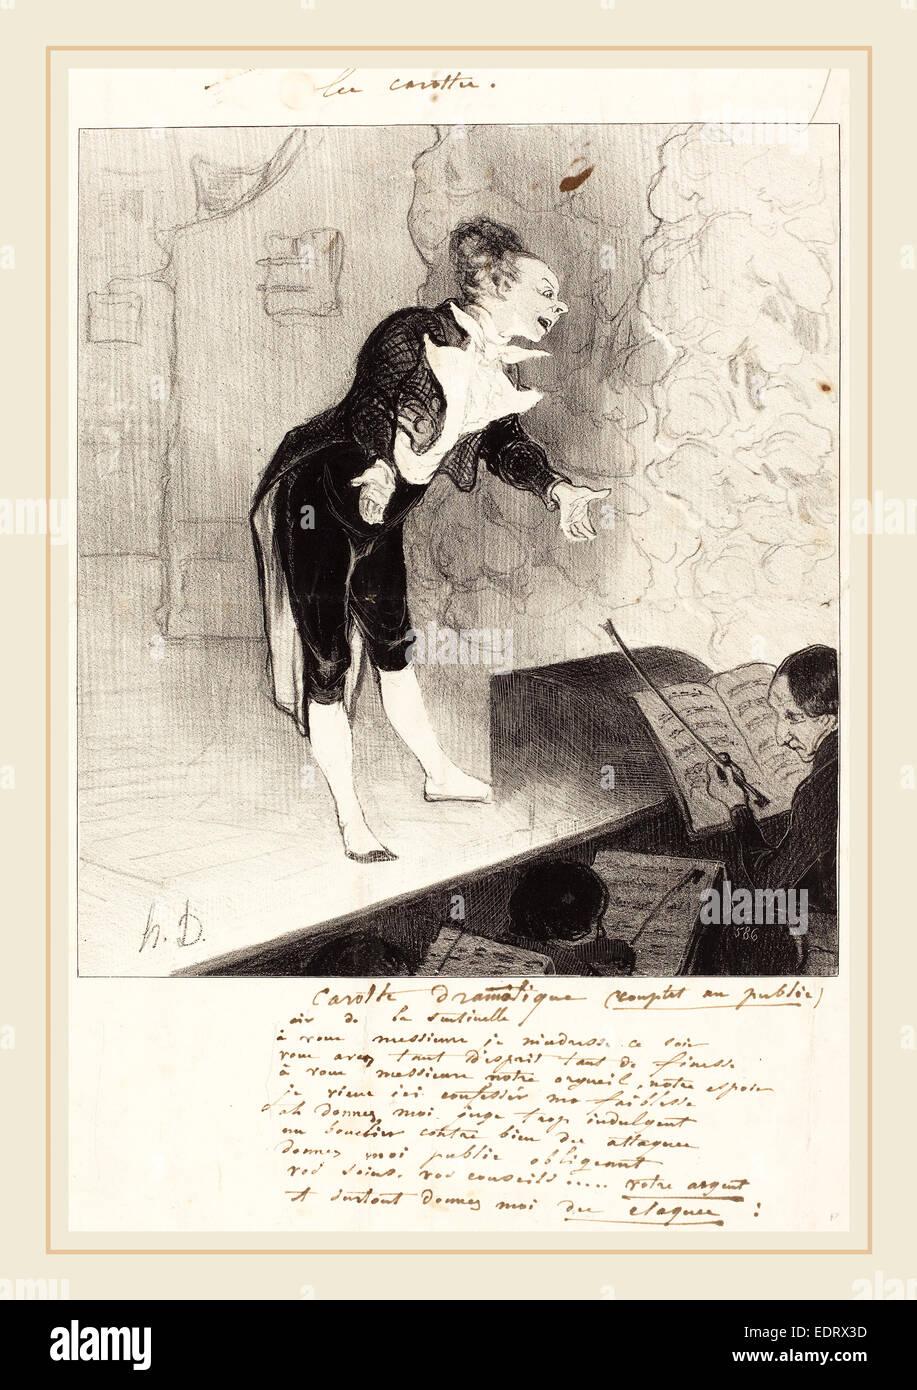 Honoré Daumier (French, 1808-1879), Carotte dramatique, 1844, lithograph - Stock Image